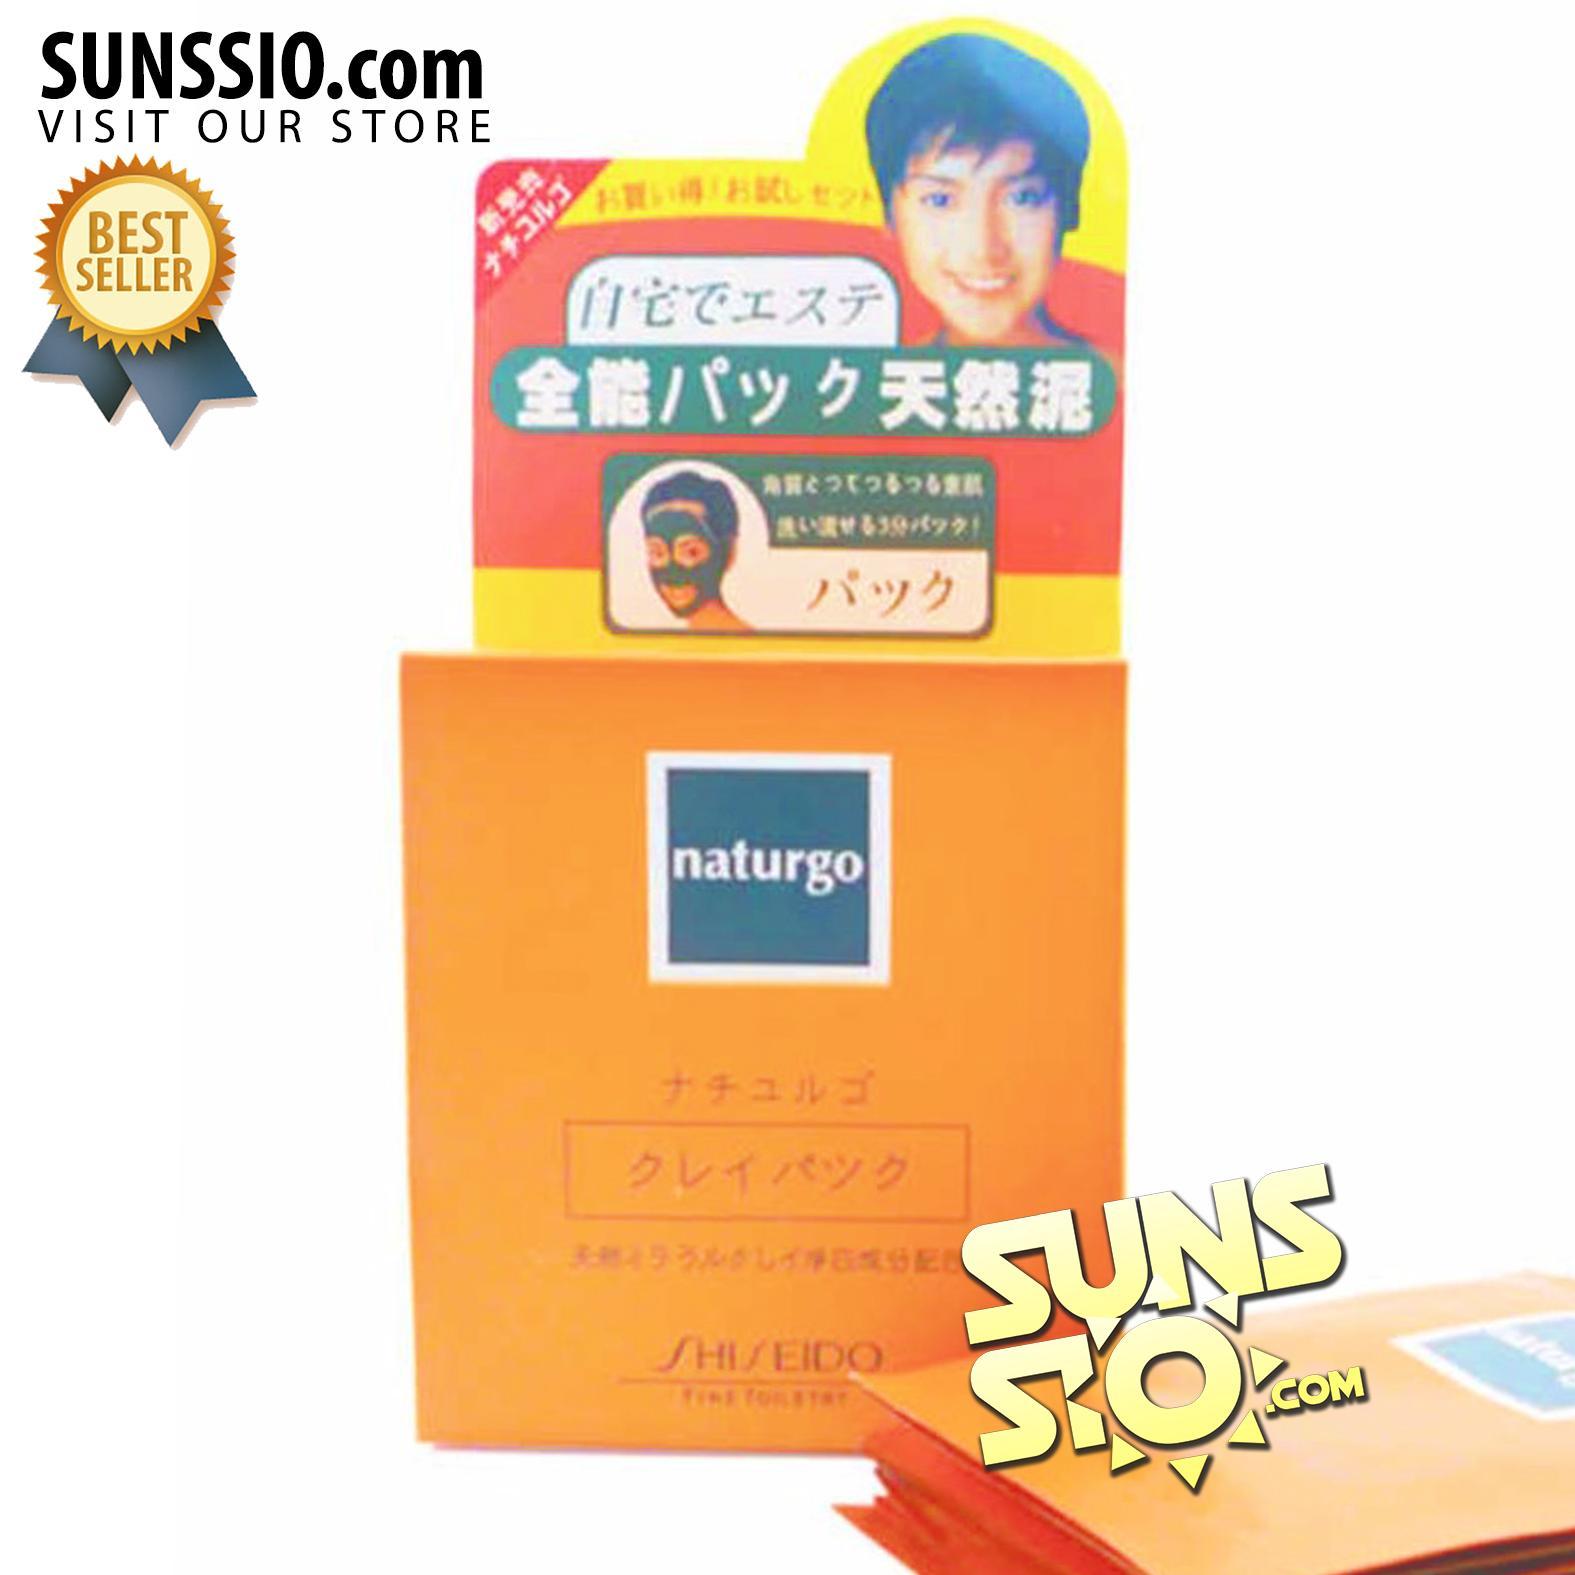 List Harga Masker Wajah Shiseido Termurah Obat Kuat Gold Naturgo Lumpur 1 Box 10 Sachet